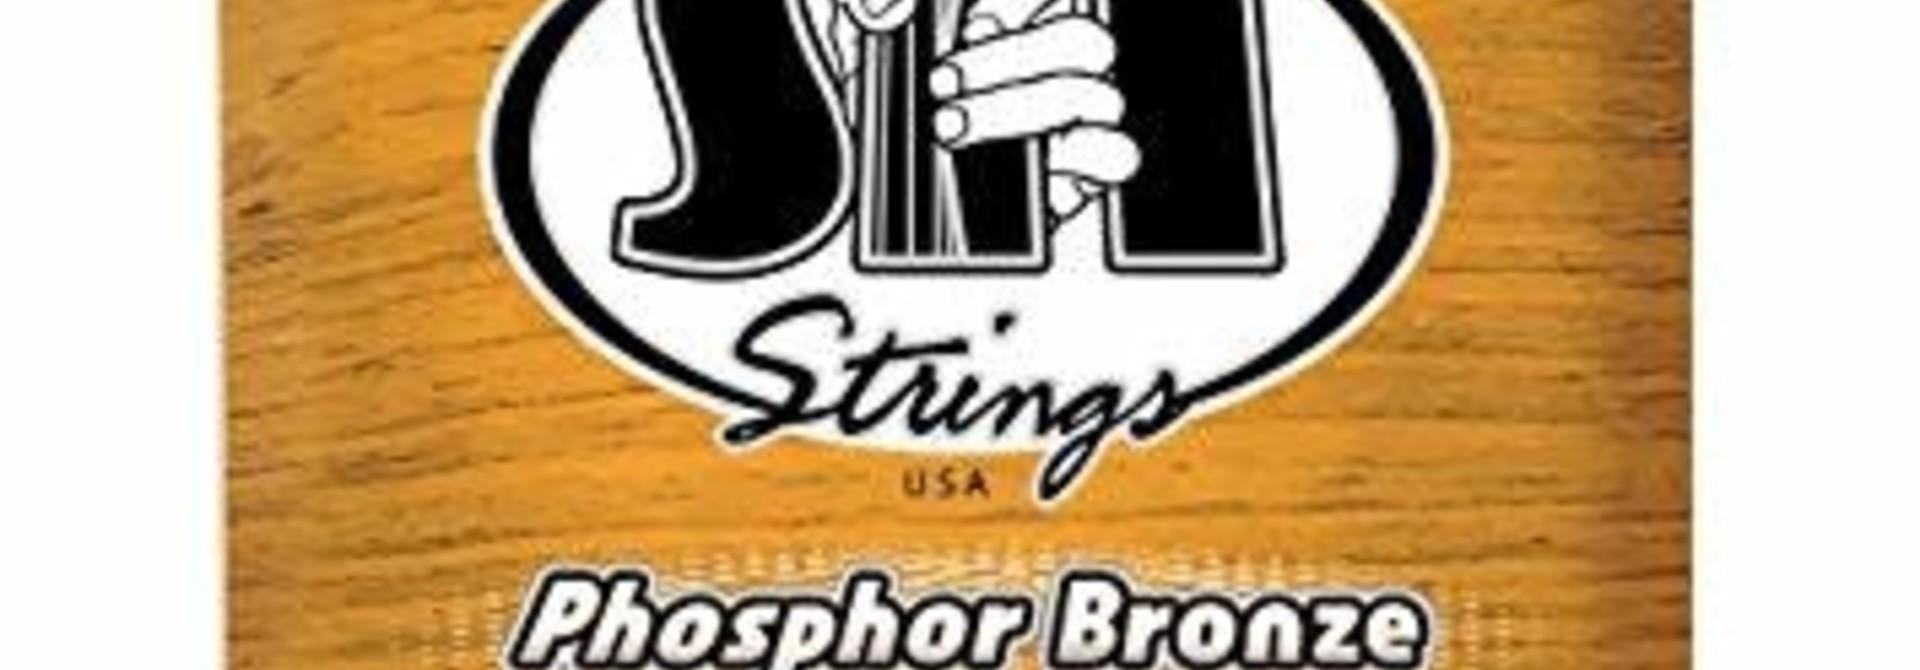 S.I.T. Strings Phosphor Bronze Acoustic Medium 13-56 P1356